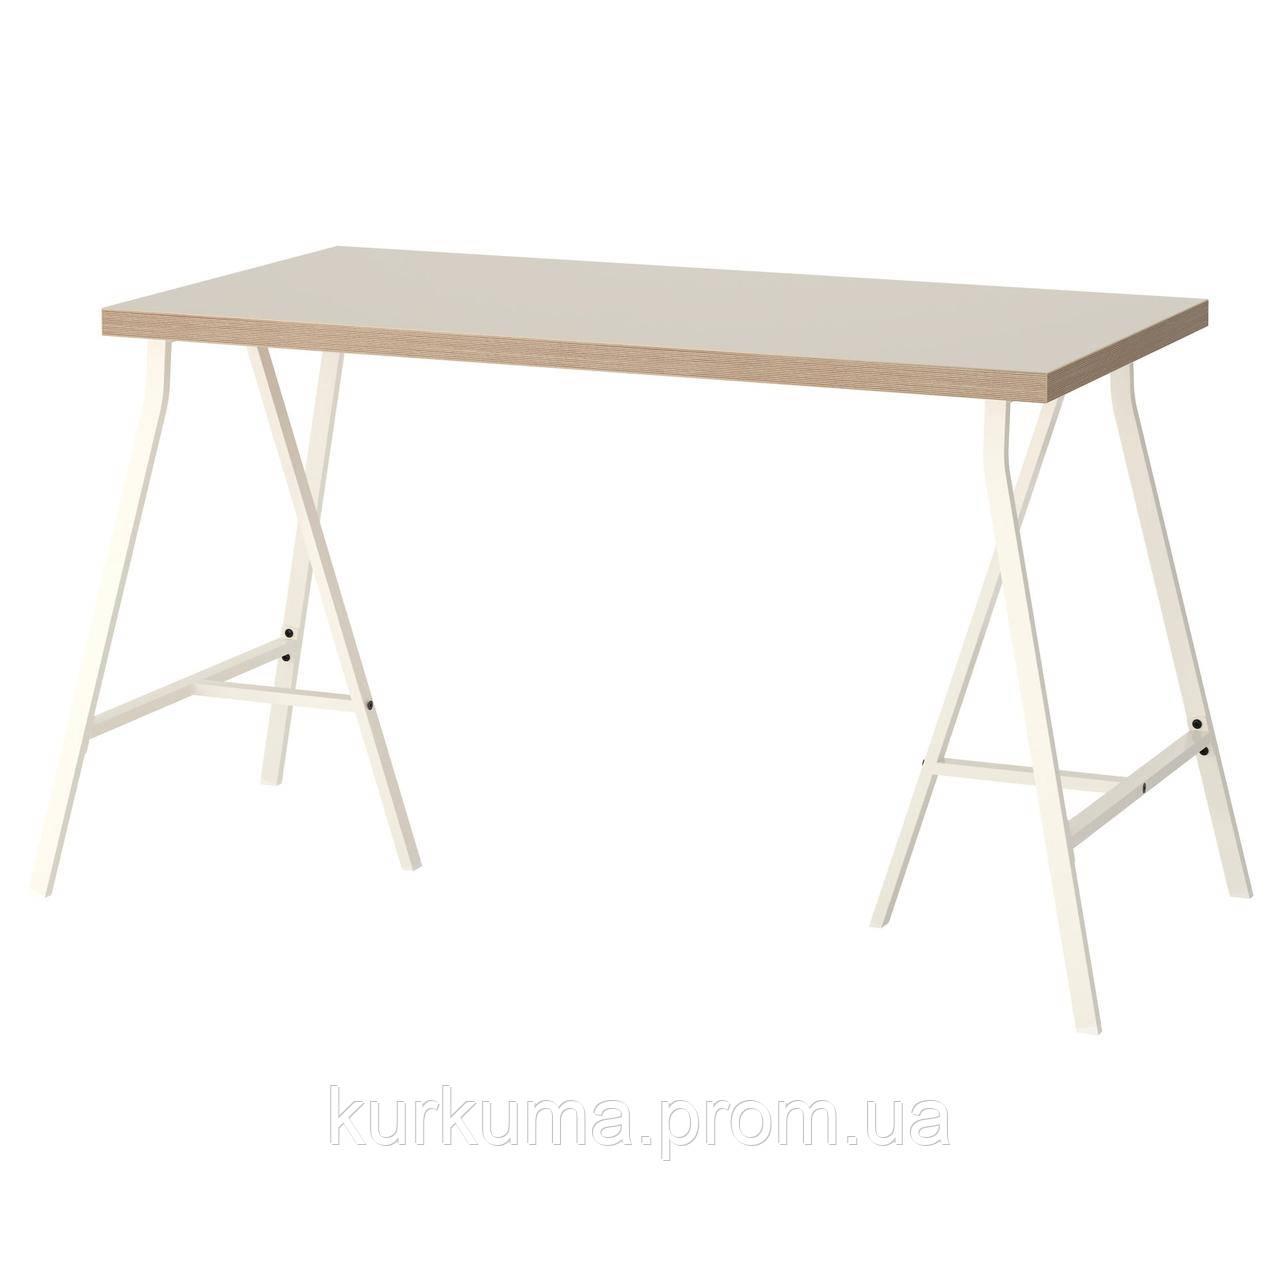 IKEA LINNMON/LERBERG Стол, бежевый, белый  (992.142.76)